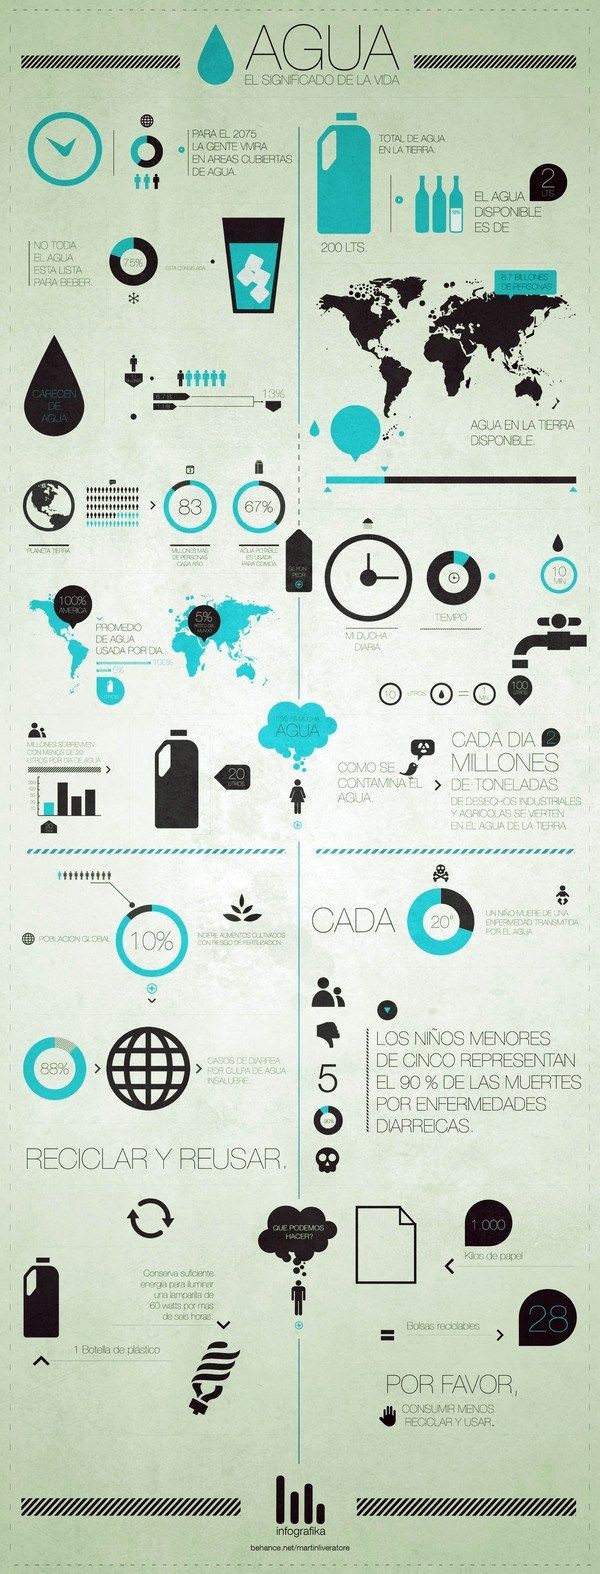 AGUA Infographic | ㄇㄞˋ點子靈感創意誌